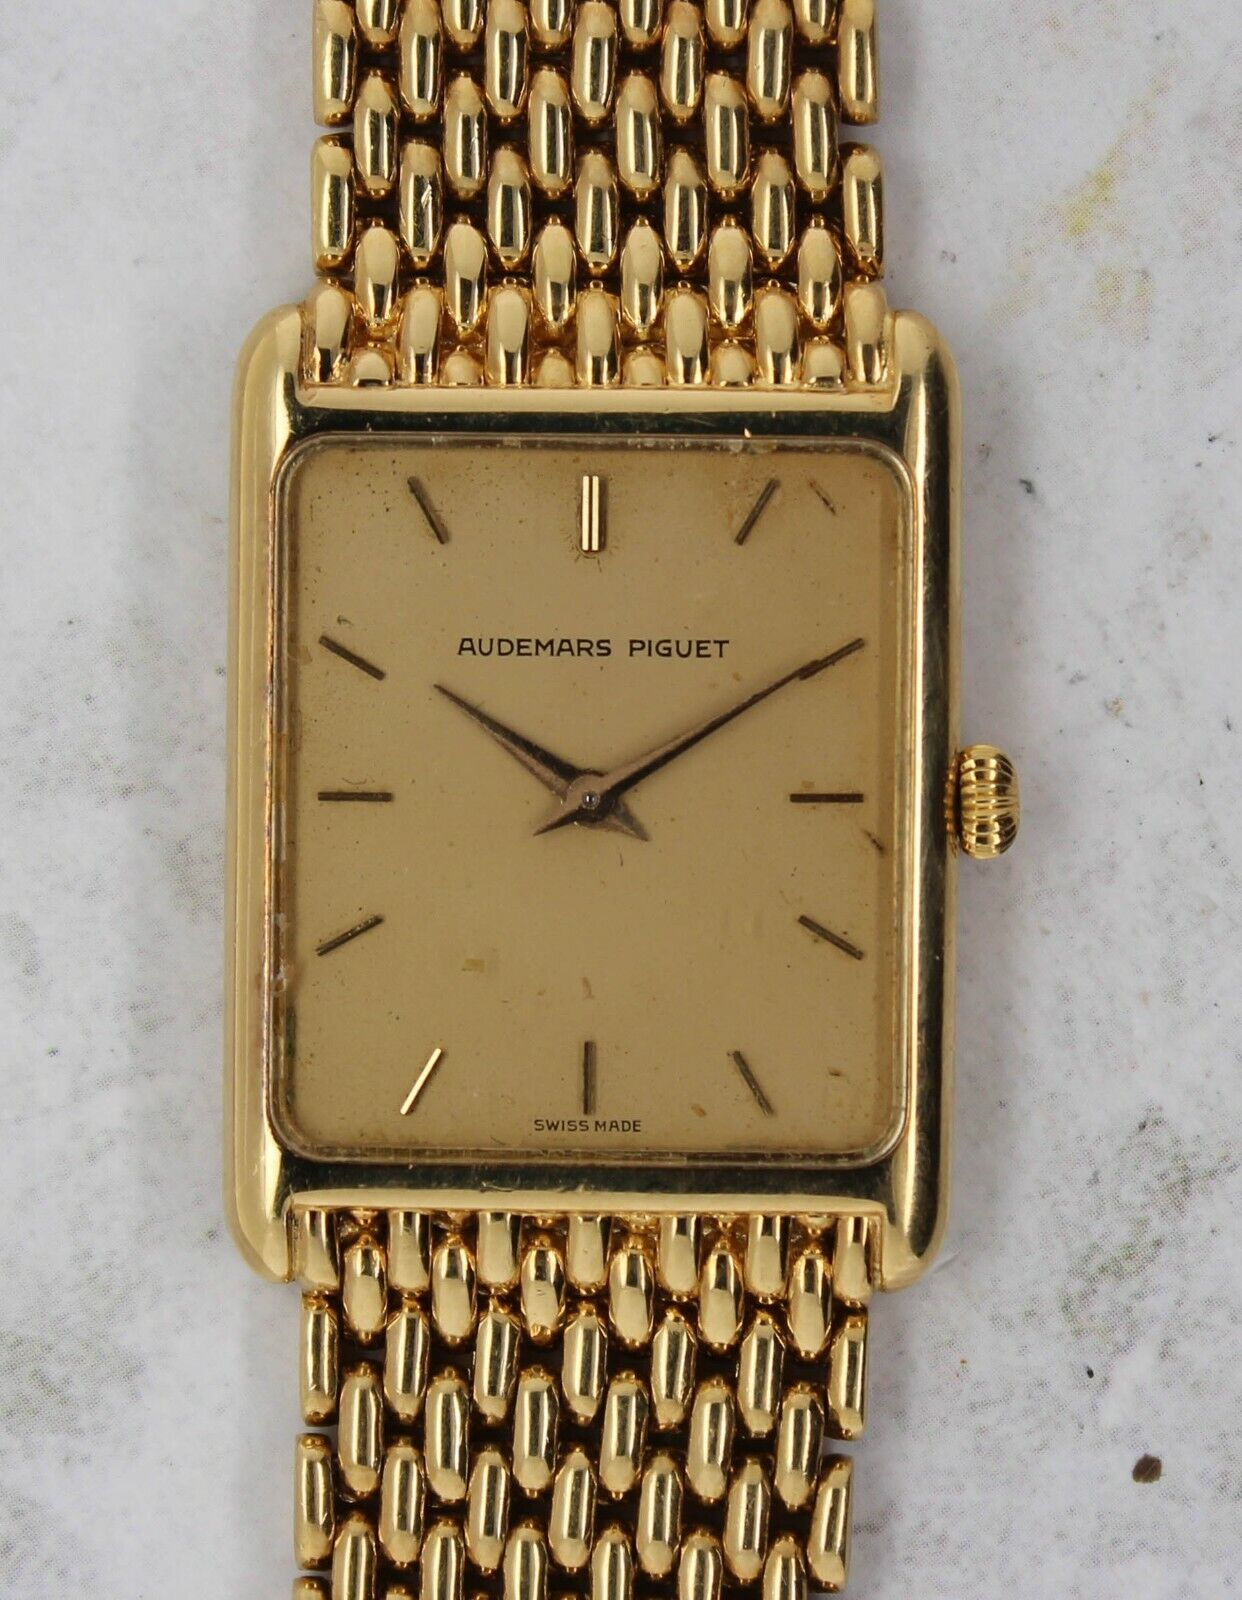 Vintage Audemars Piguet Time Only Dress Wristwatch 18kt Yellow Gold RARE NR - watch picture 1